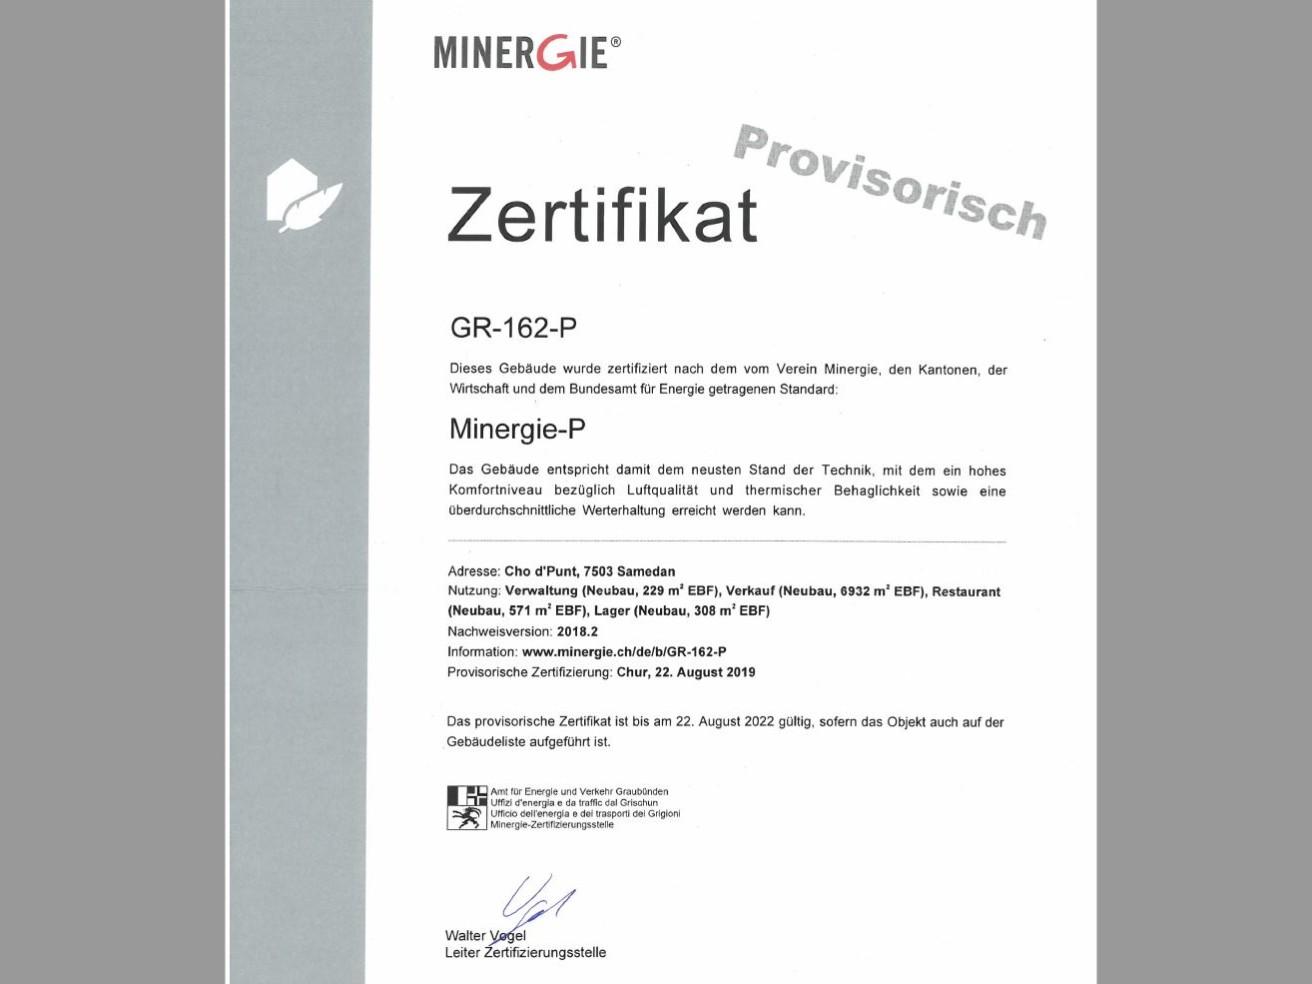 Minergie-P Zertifikat